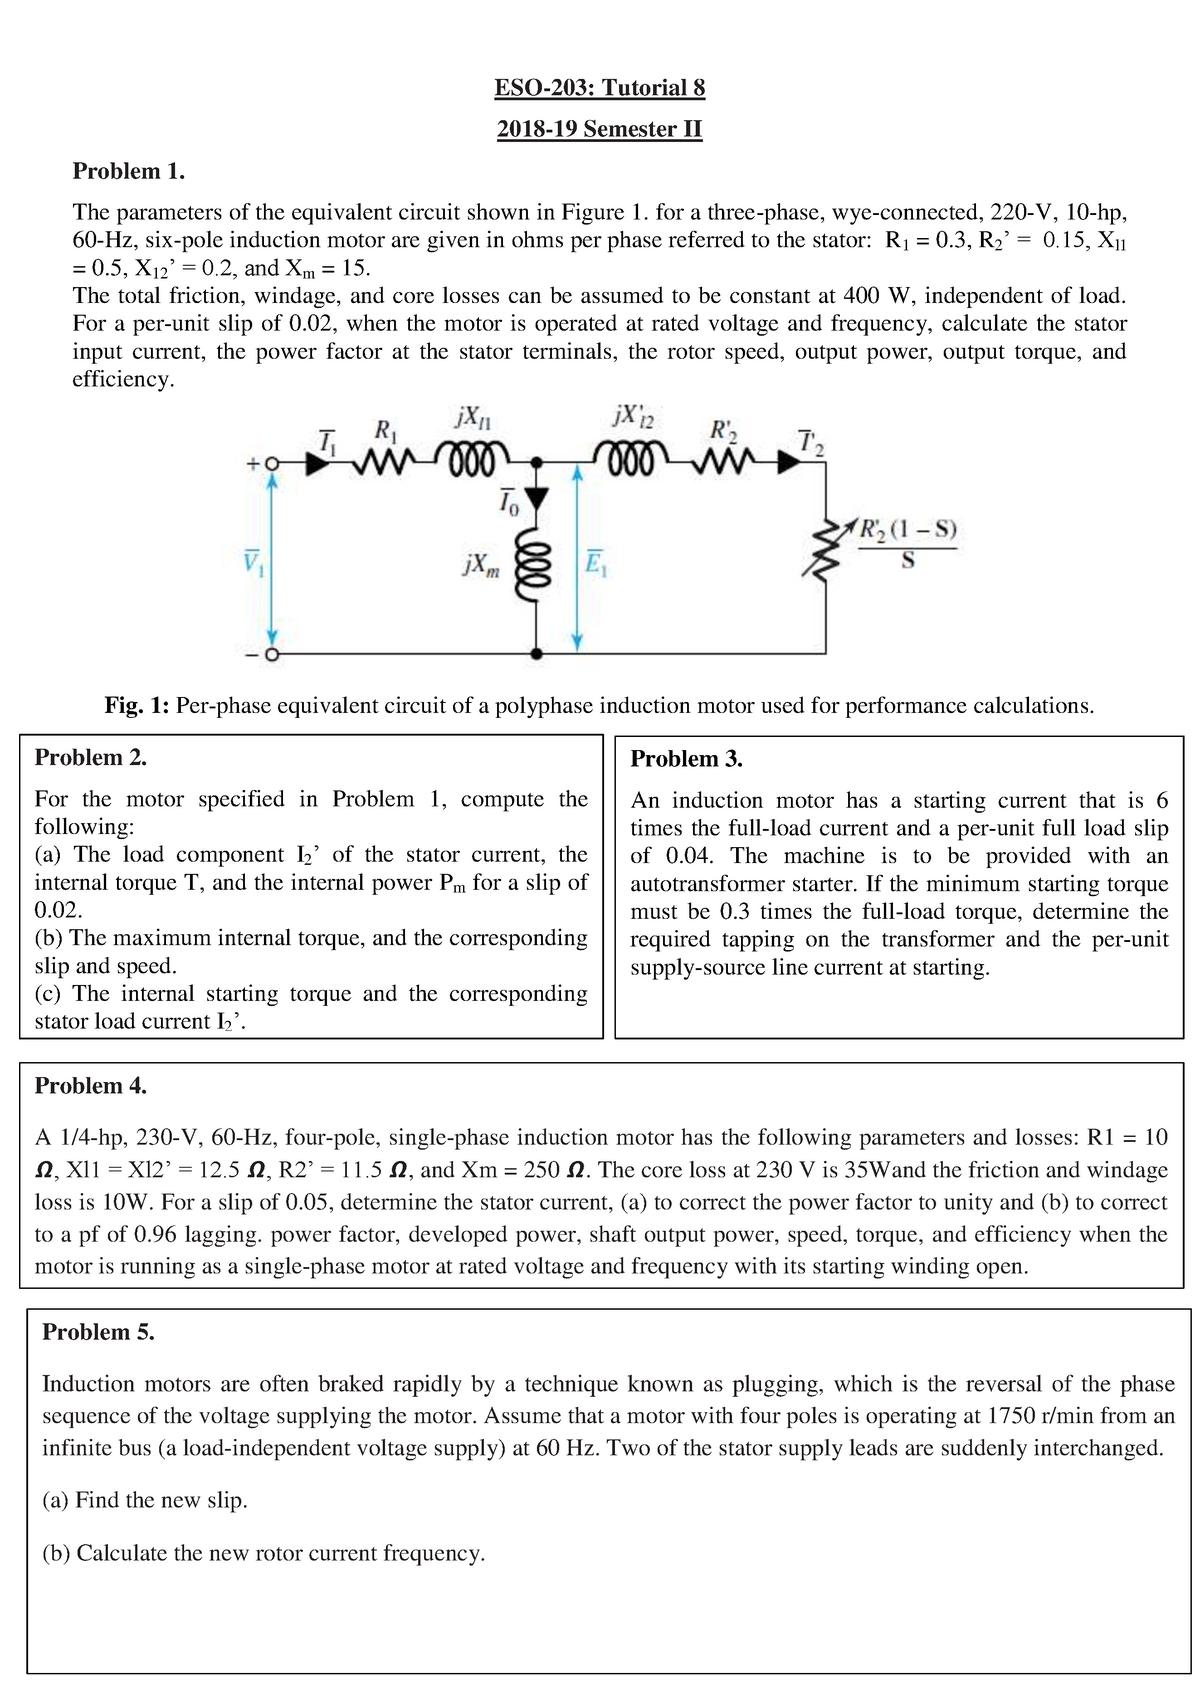 Tutorial-8-questions 22232 - EE210: Microelectronics I - StuDocu